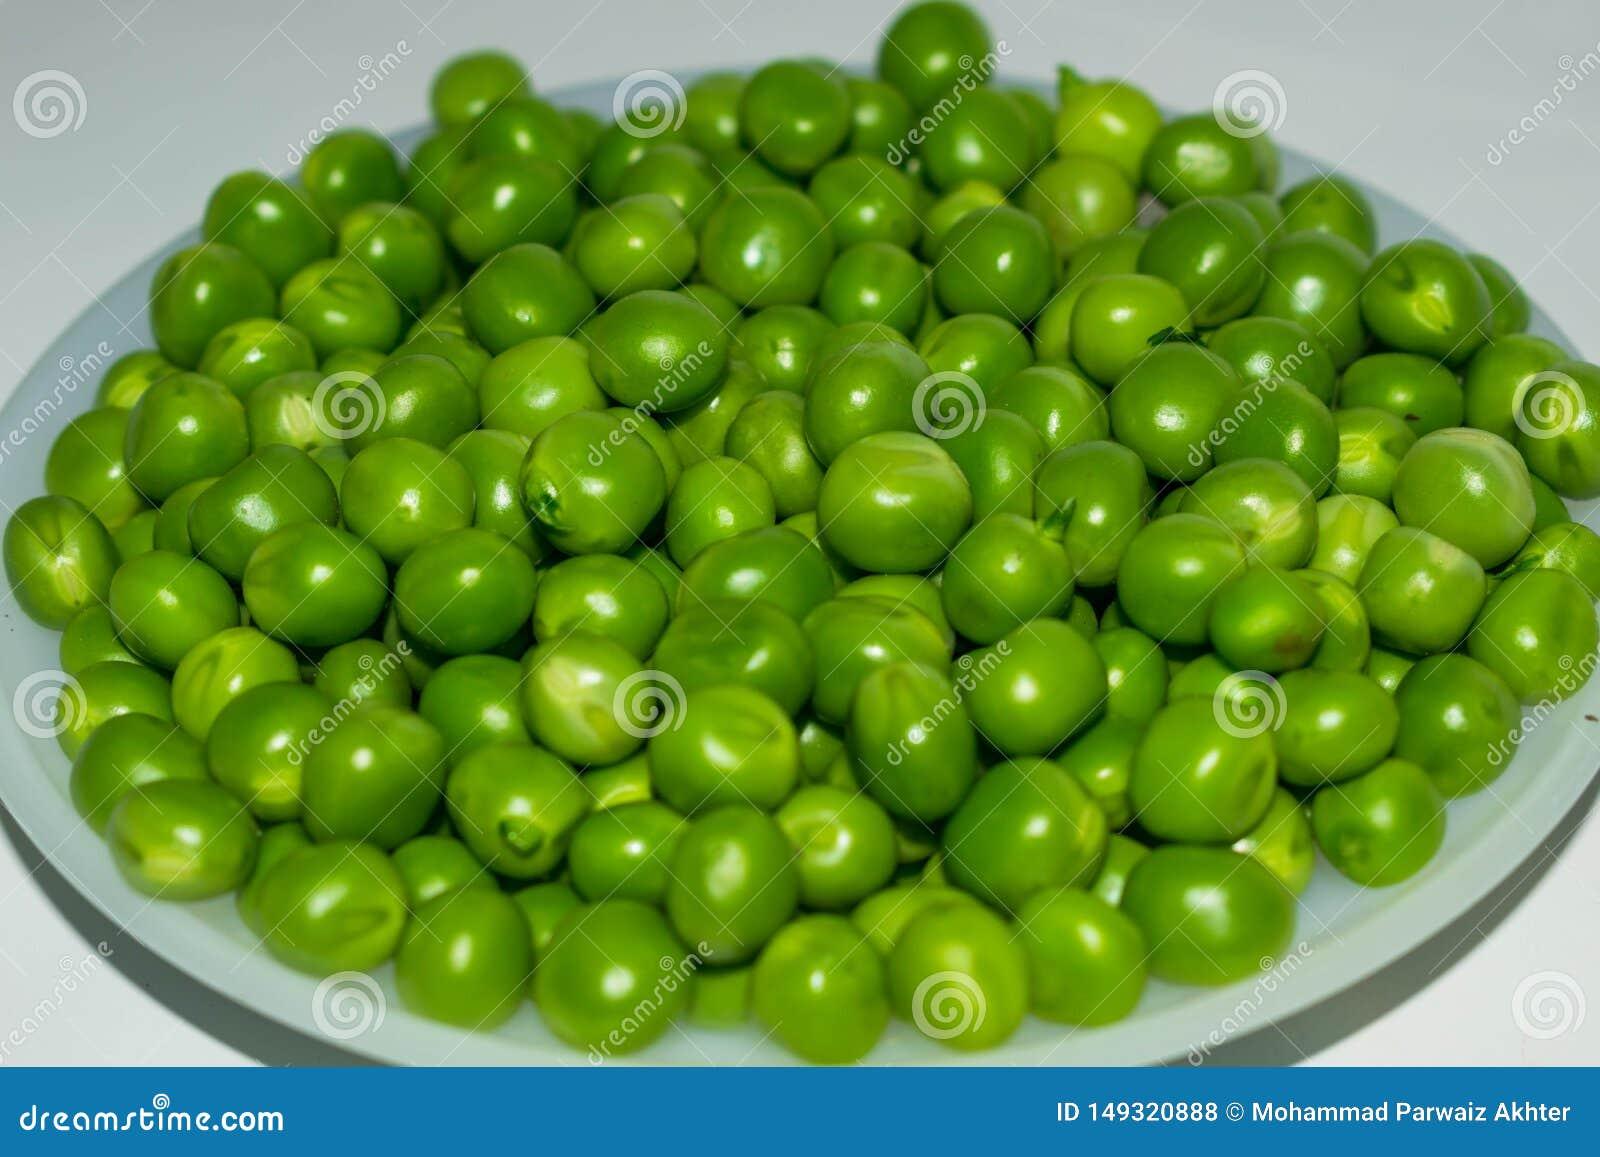 Green pea pod,green peas in a white bowl